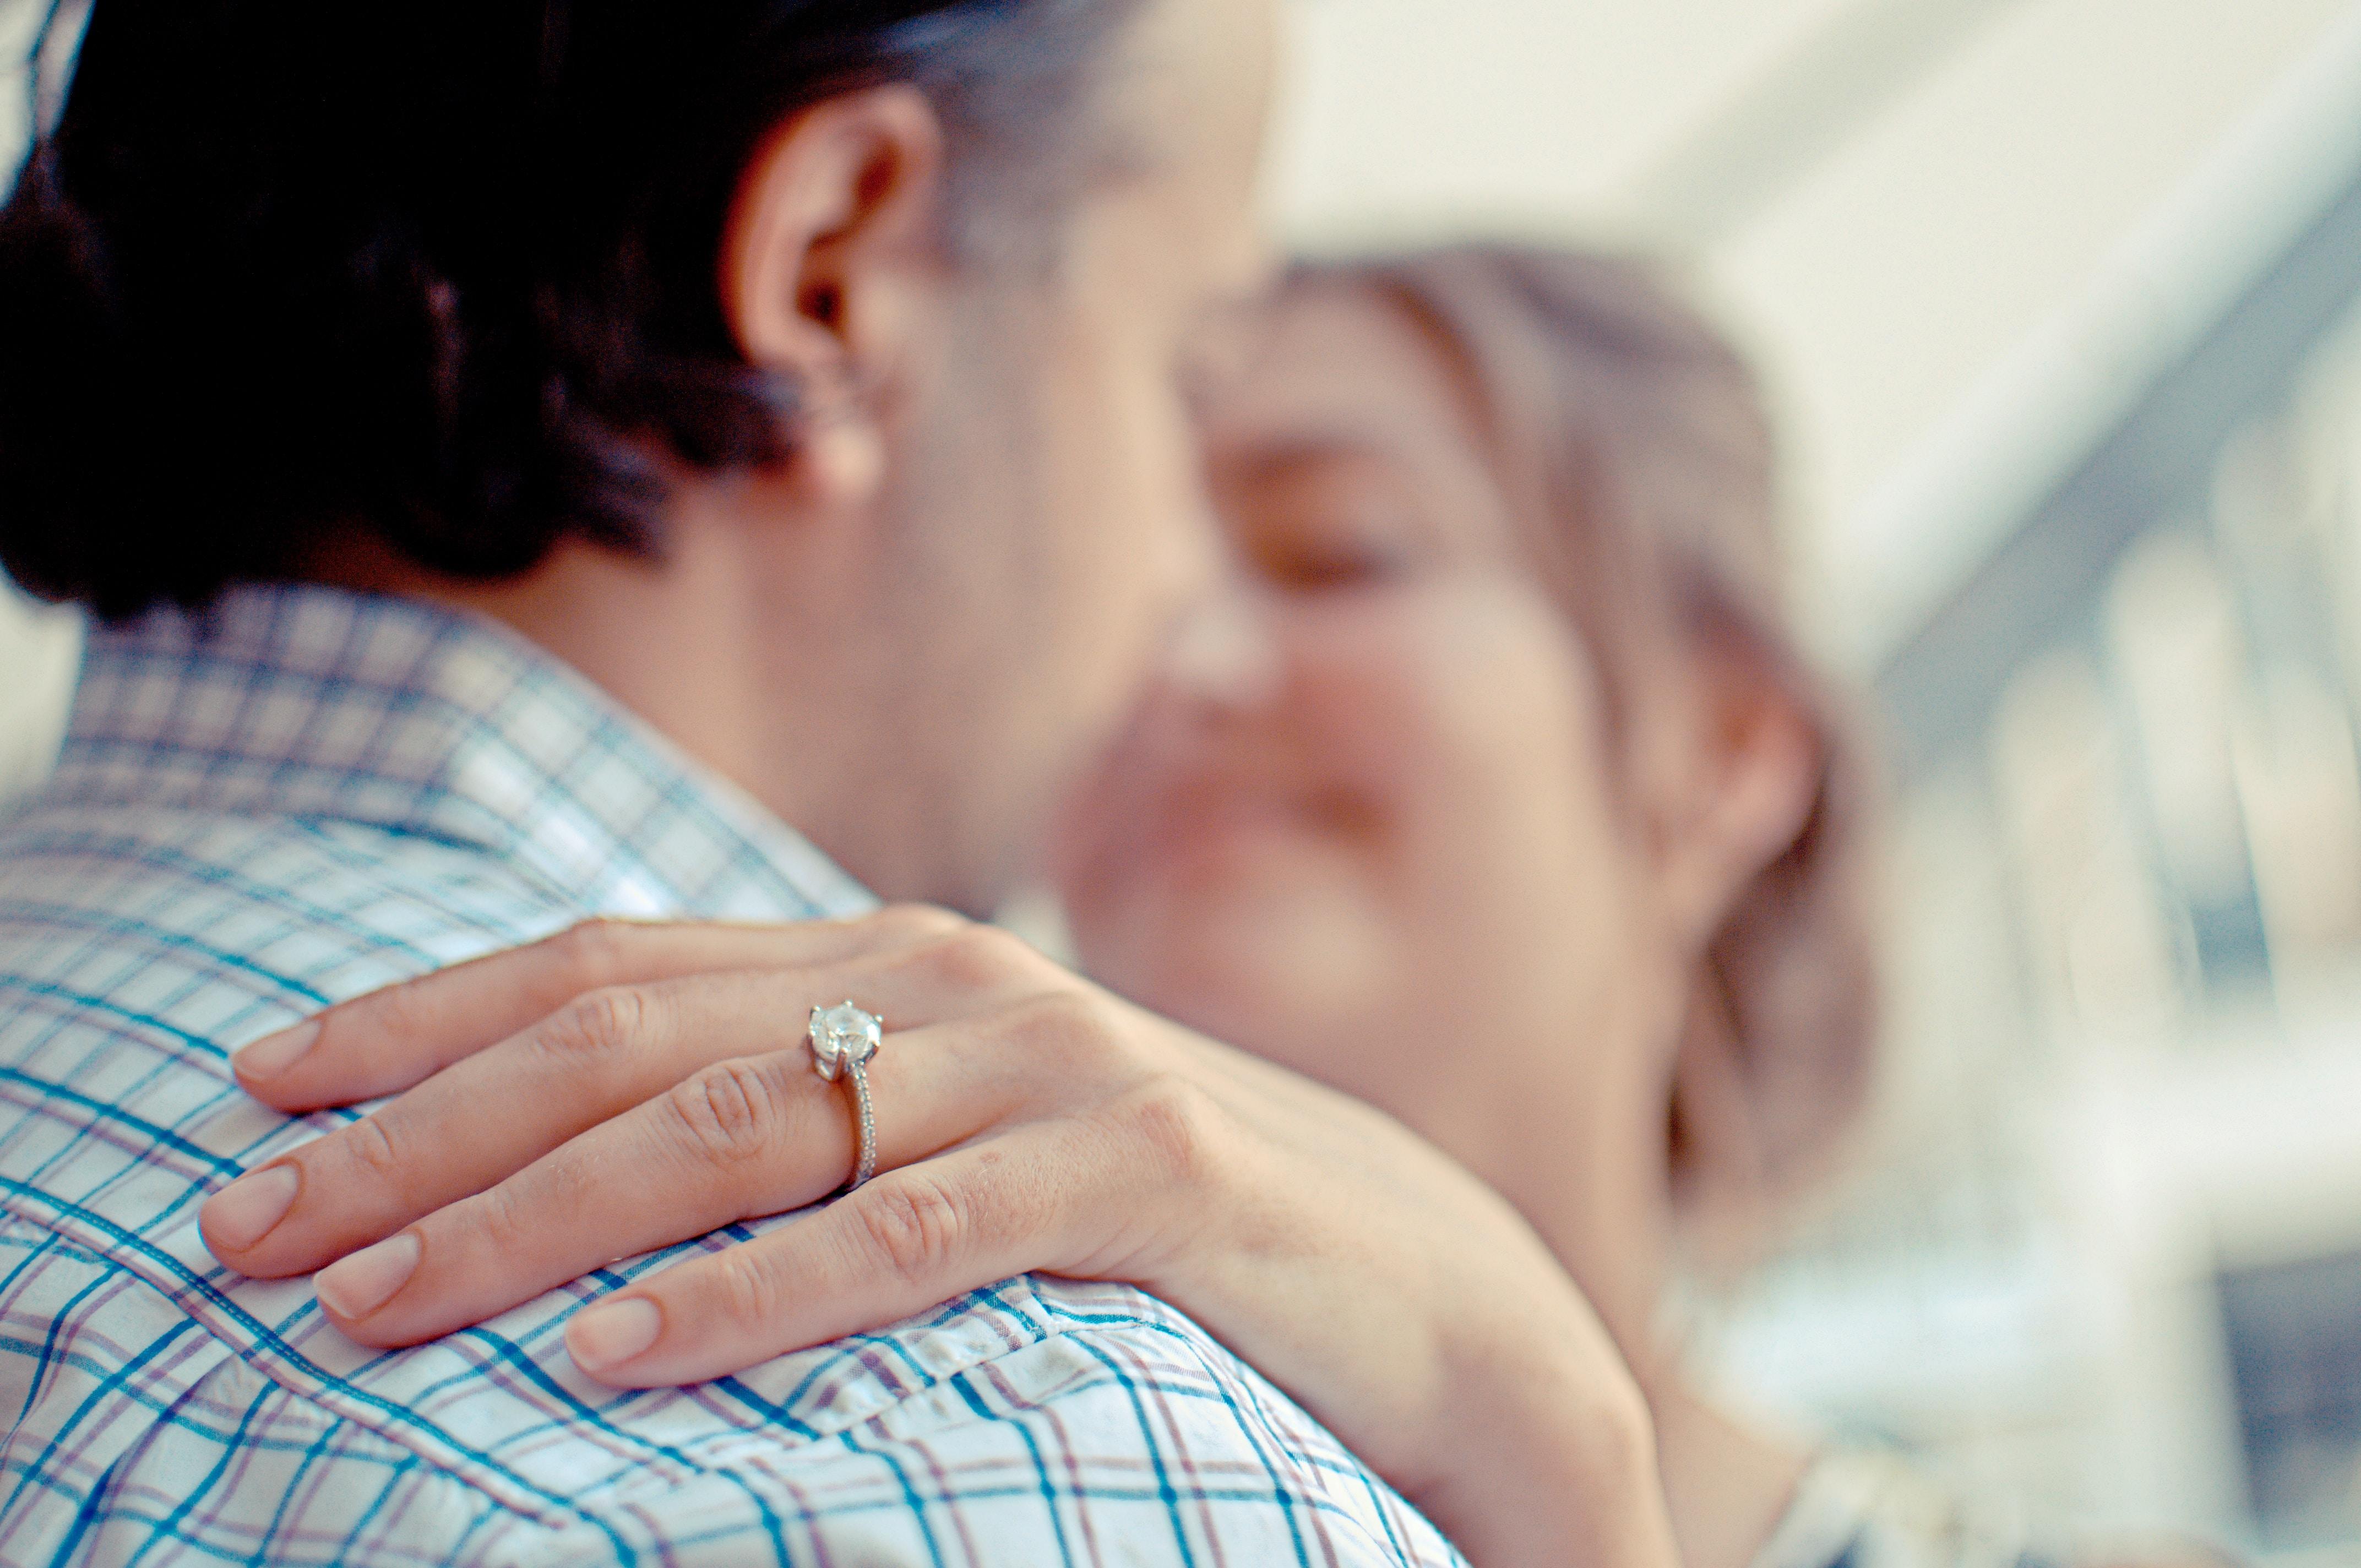 Bride's hand sits on groom's shoulder showing off her wedding ring